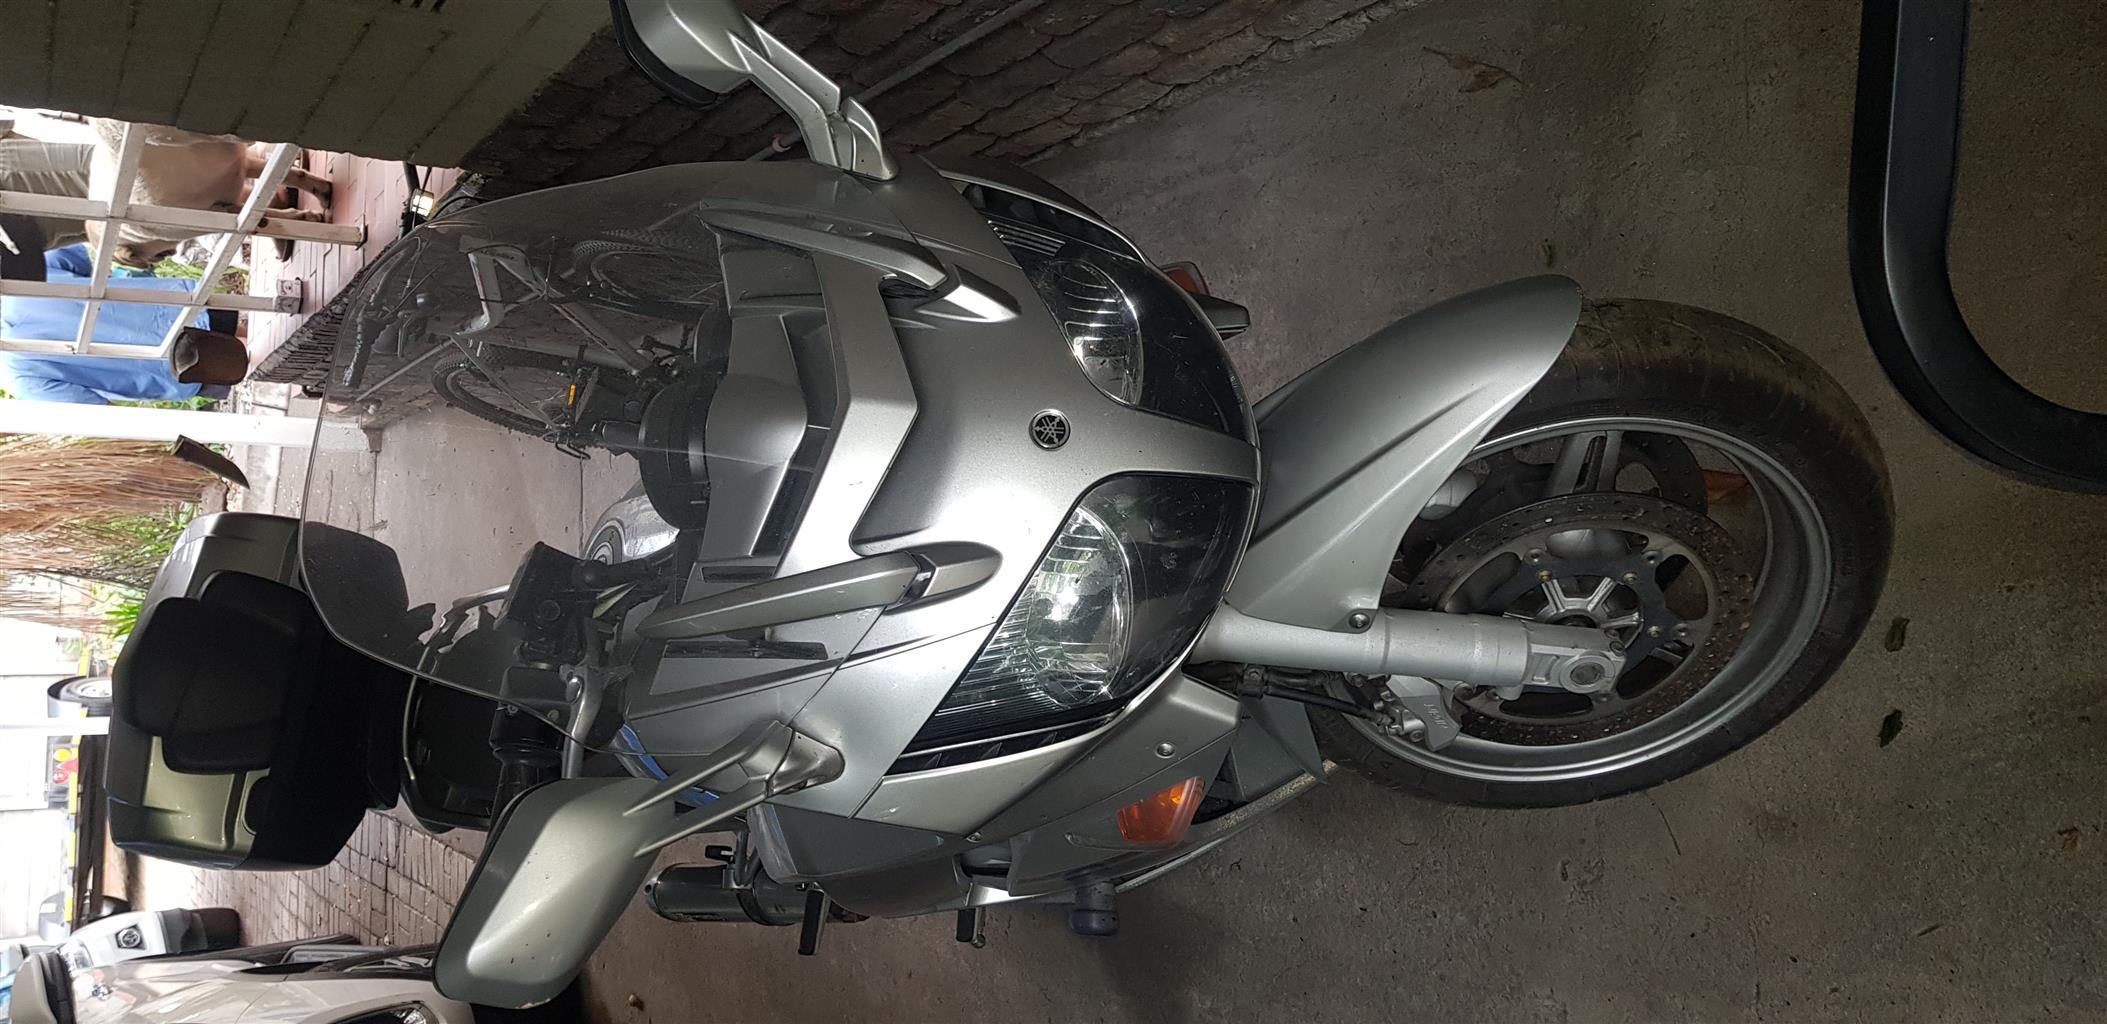 2009 Yamaha FJR1300 | Junk Mail